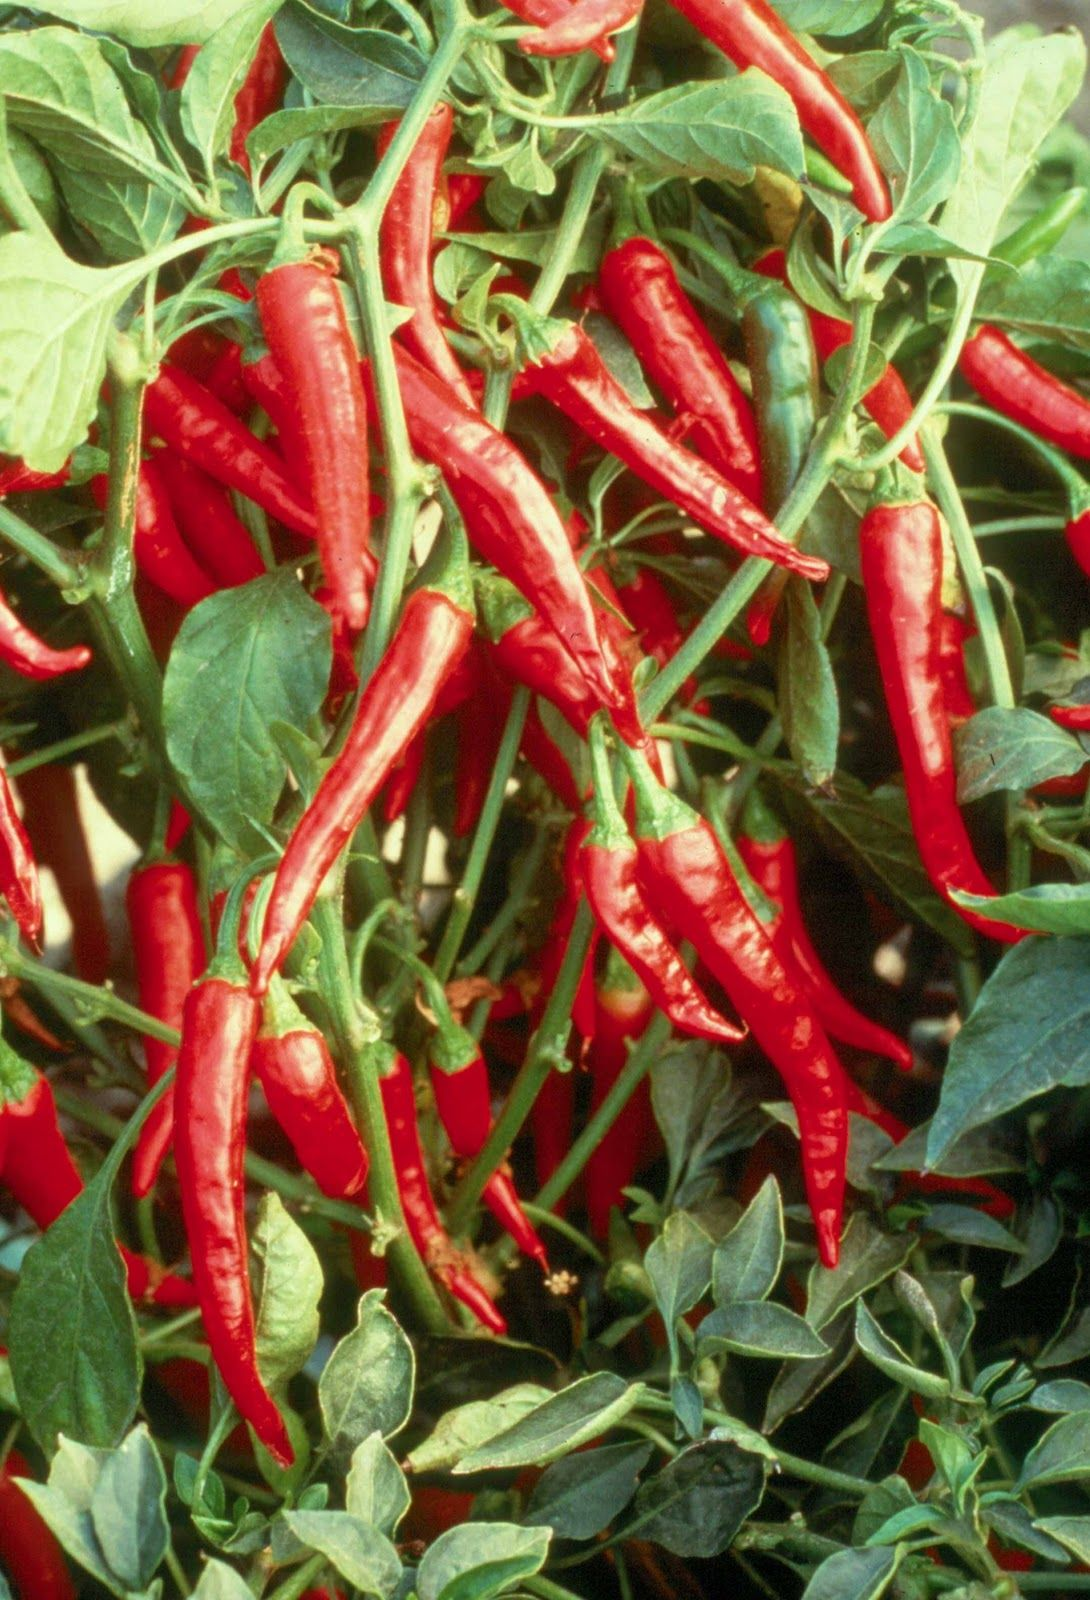 Hot Pepper Plants Ready On The Farm